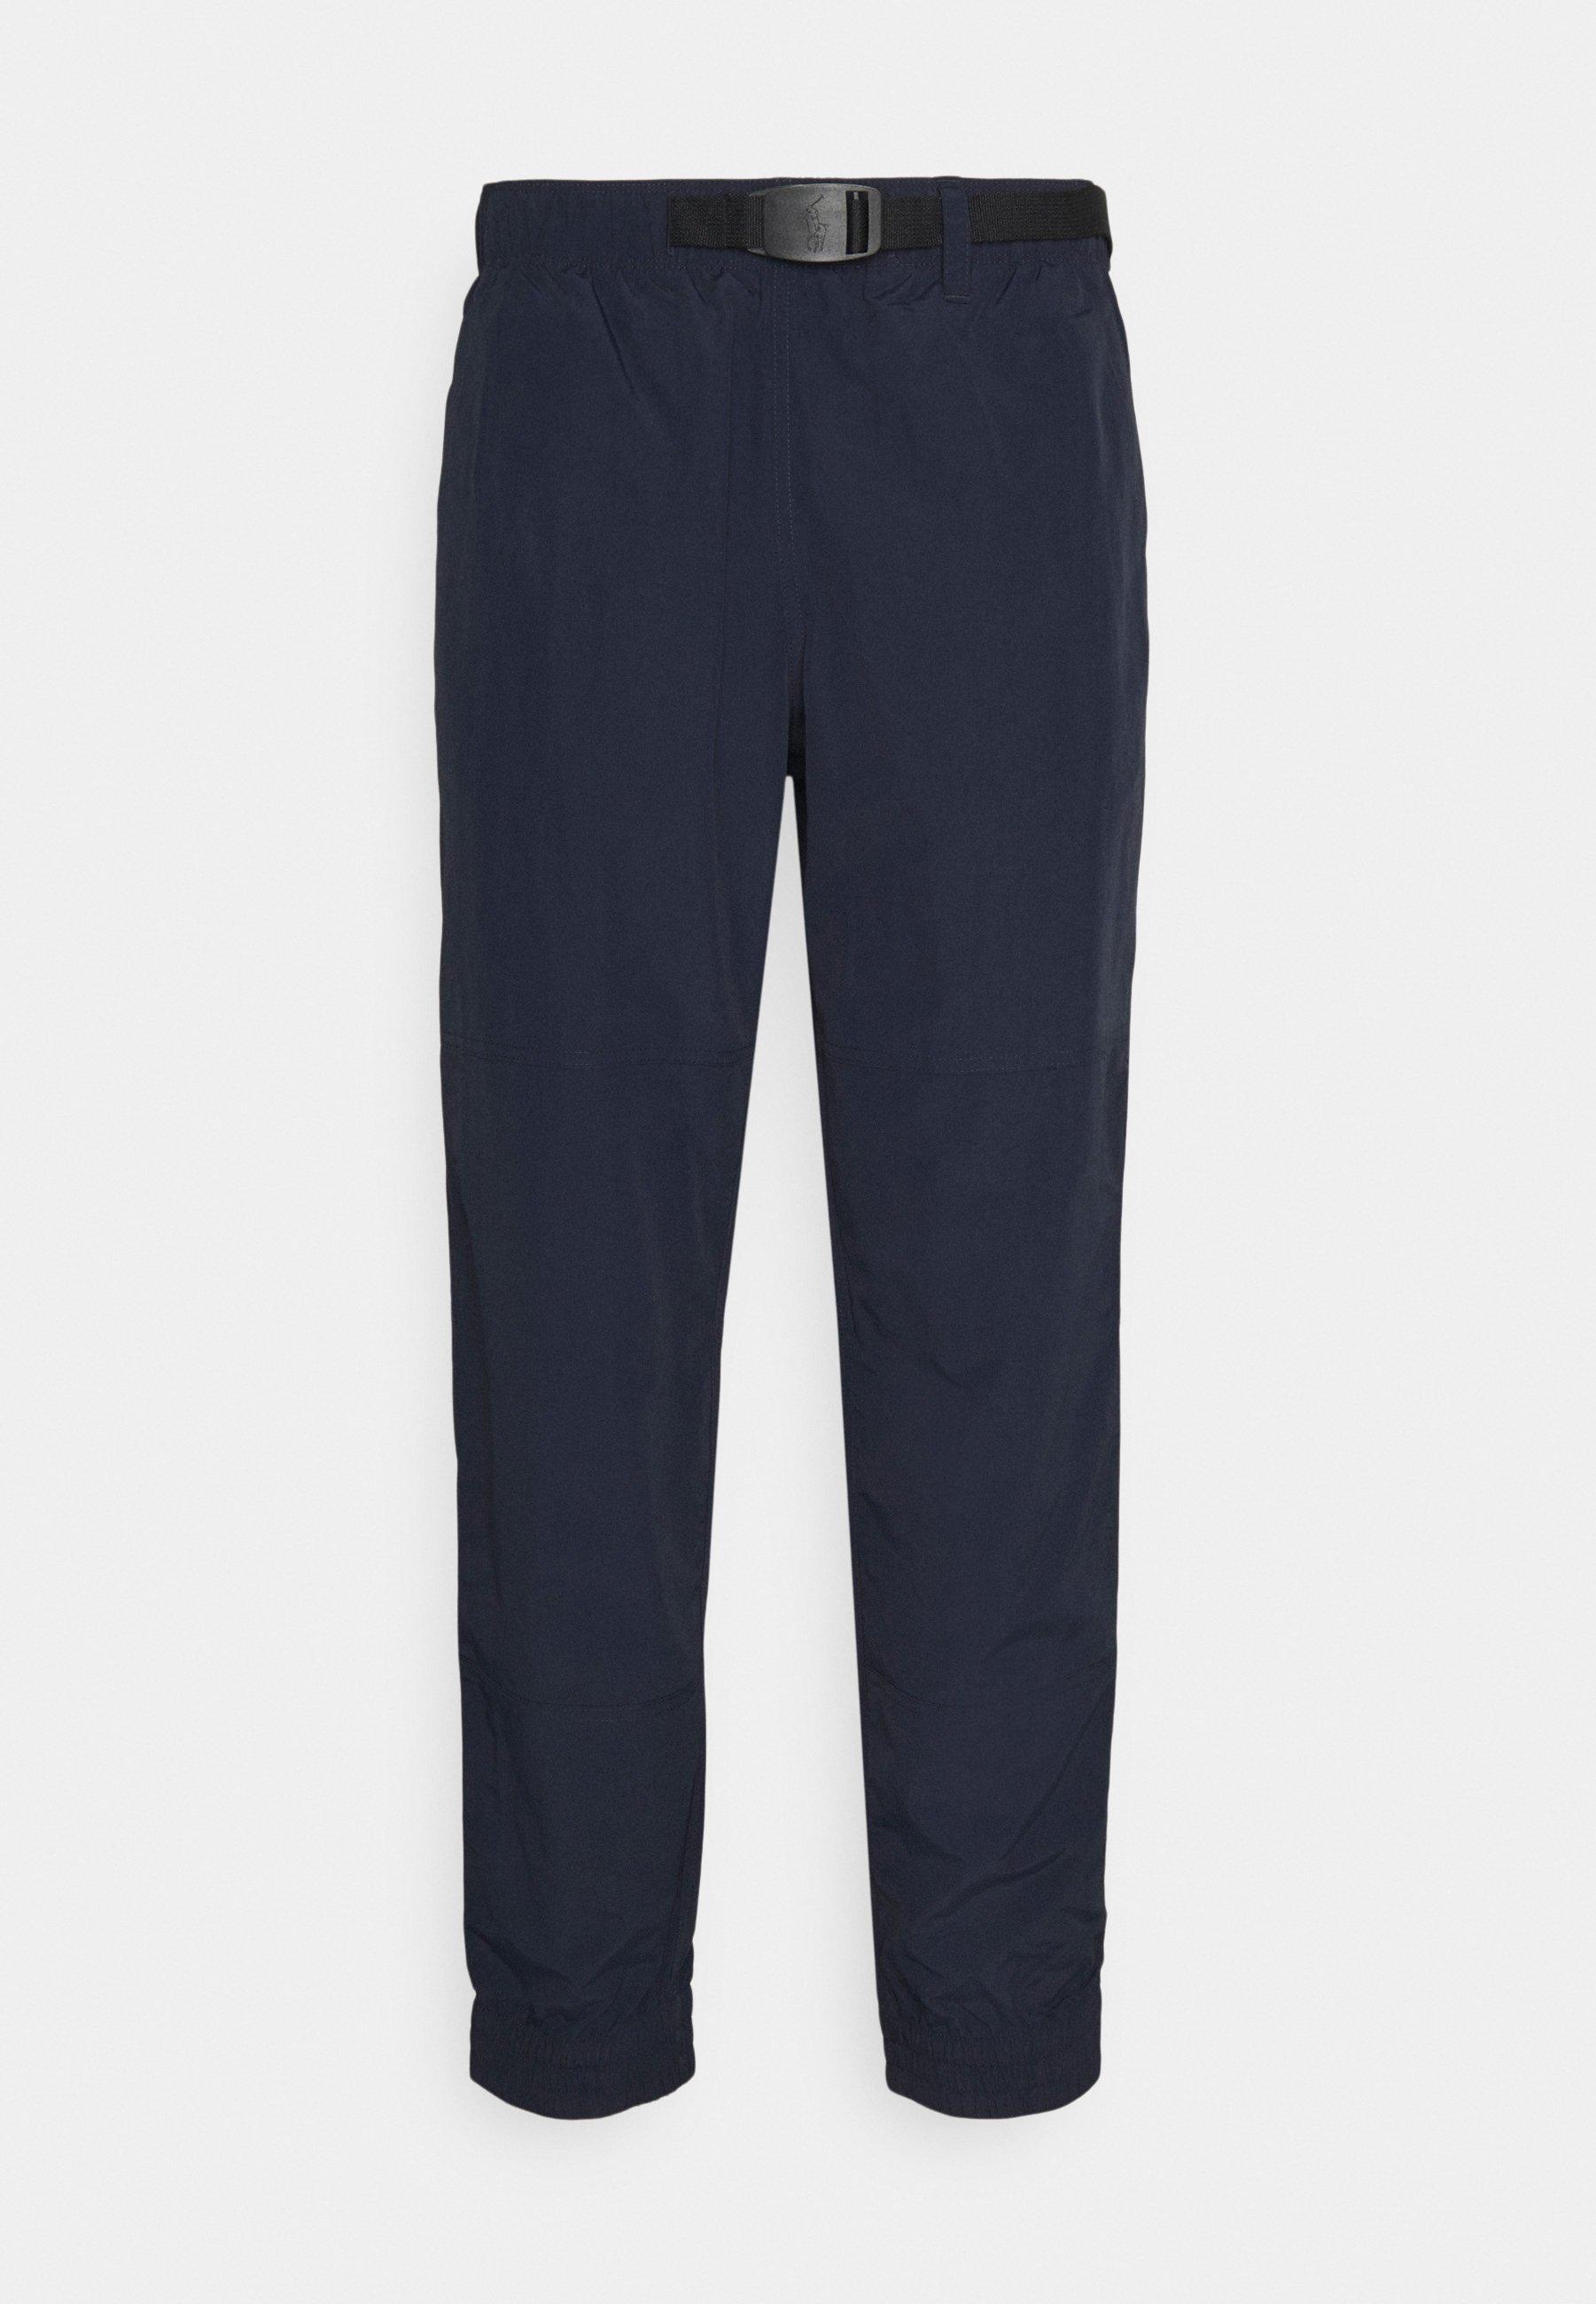 Uomo CLASSIC TAPERED FIT HIKING PANT - Pantaloni